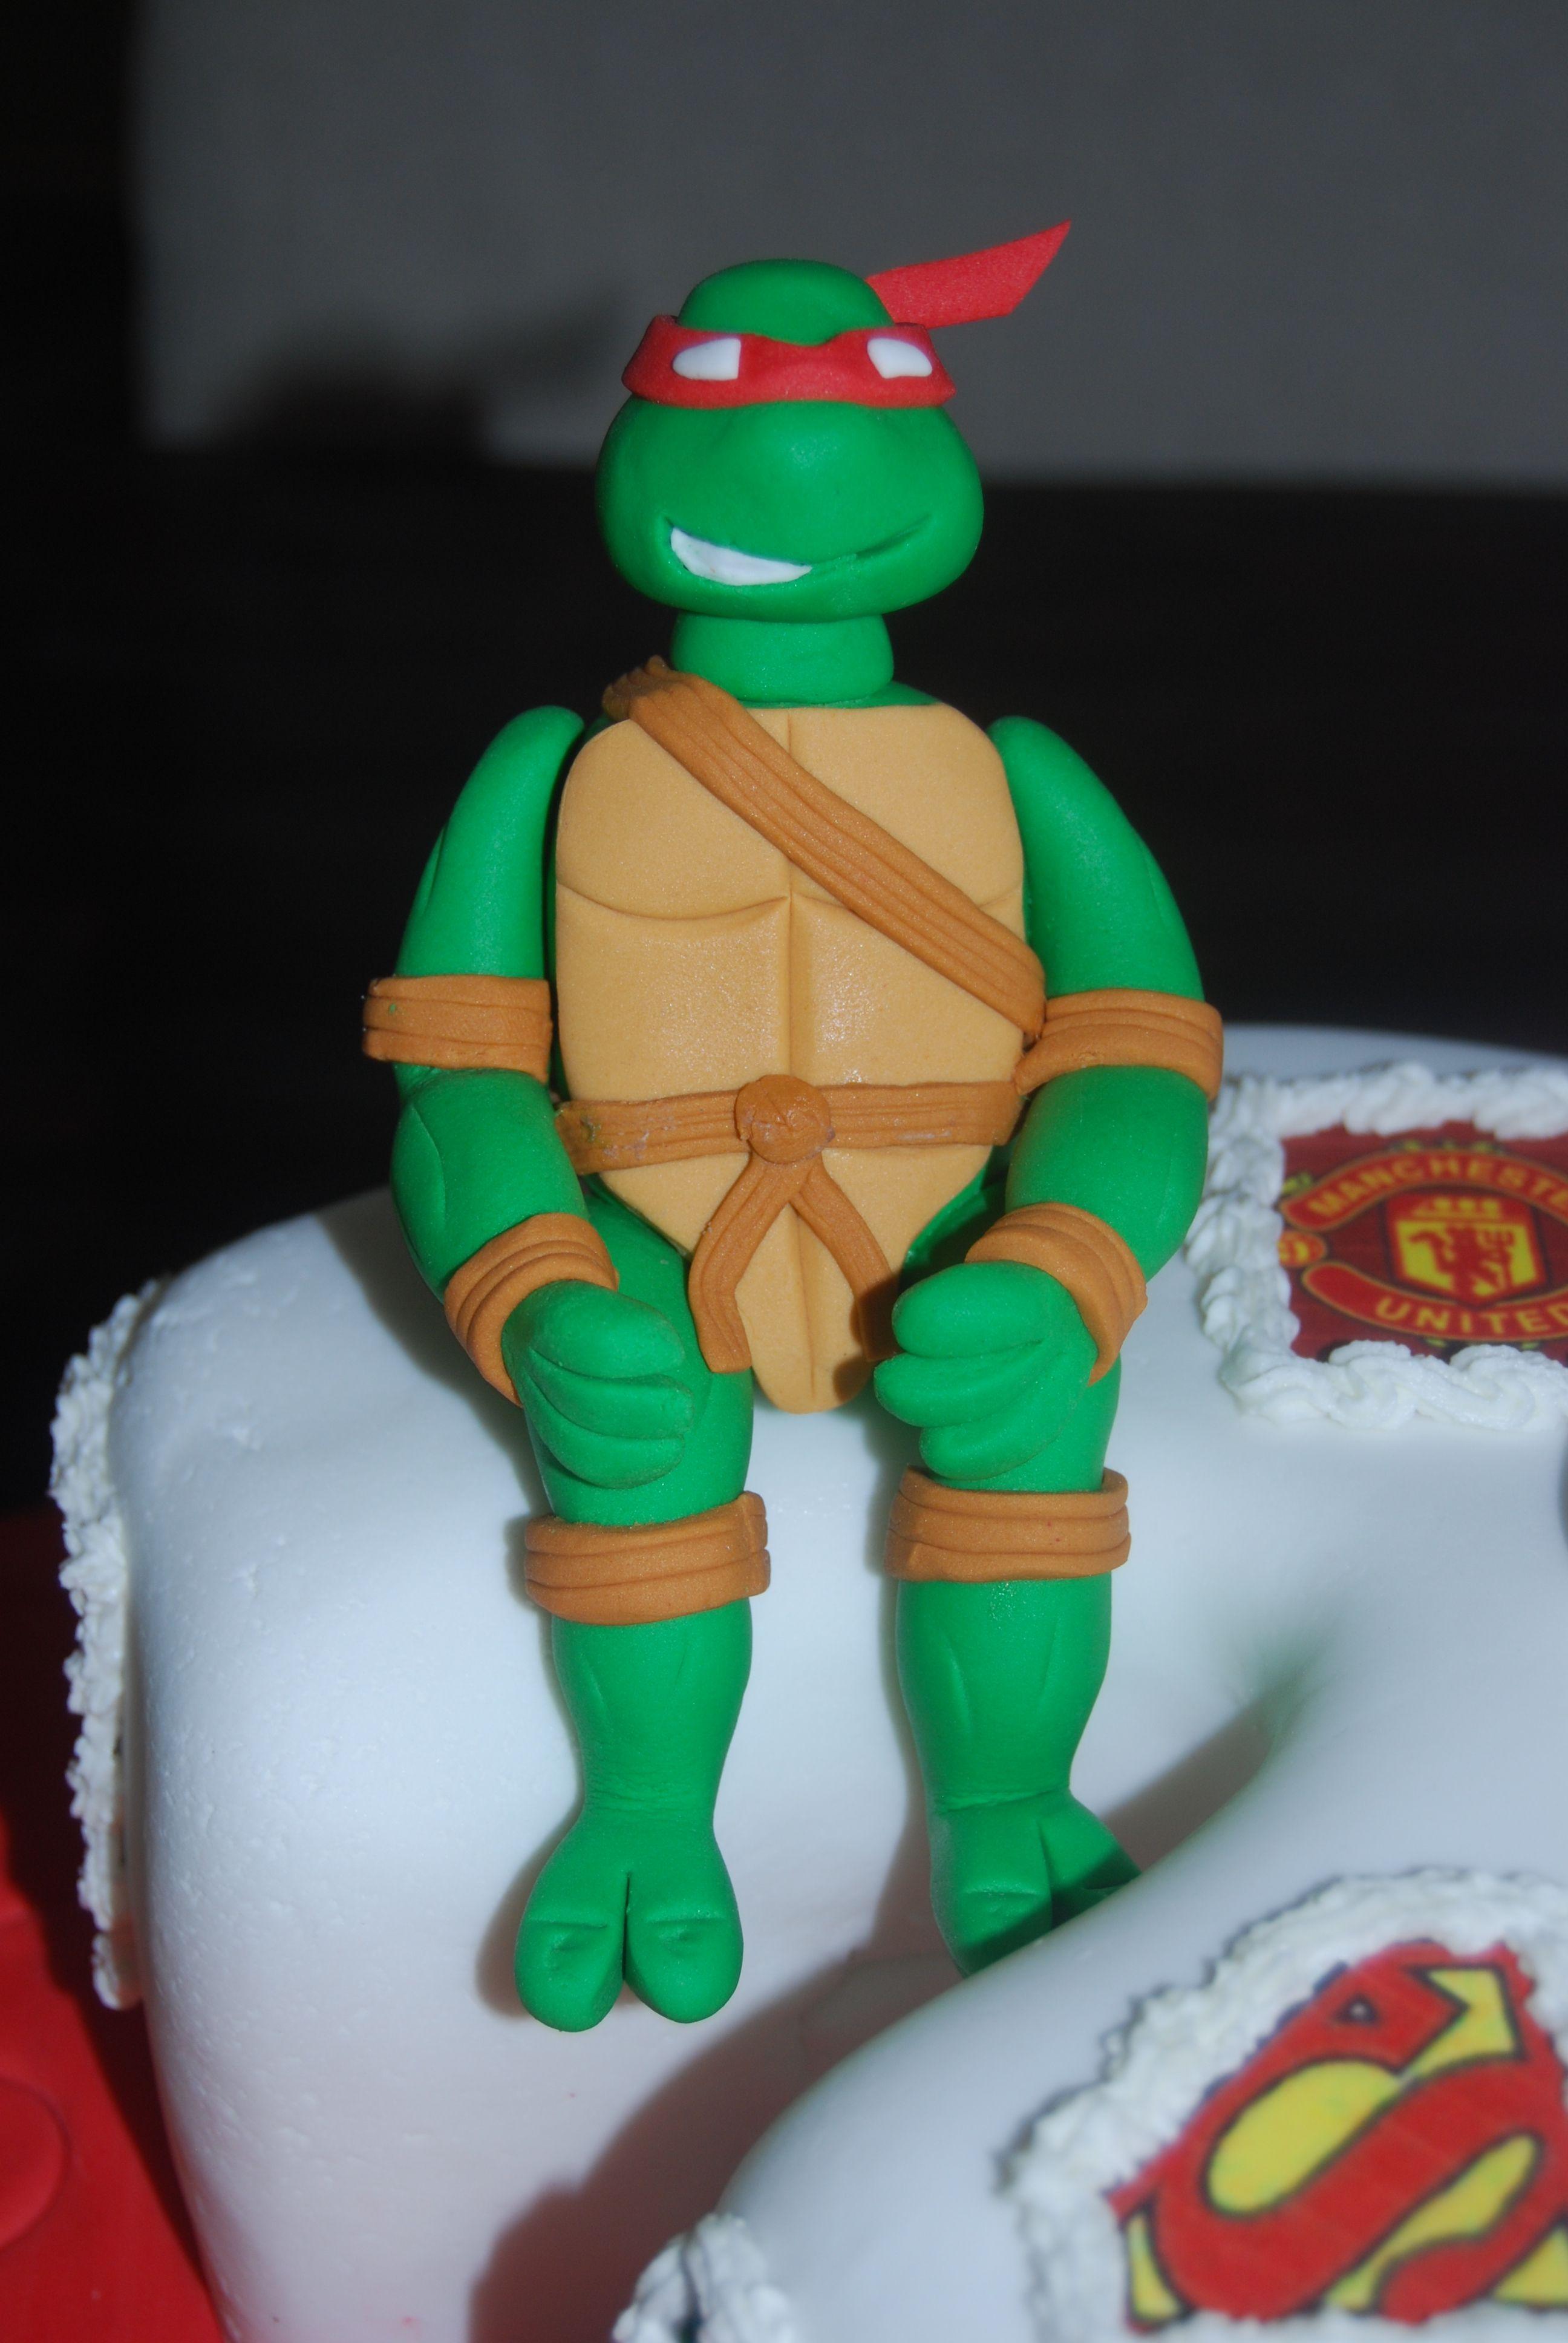 Raphael of the Ninja Turtles sitting on a 3rd Birthday cake